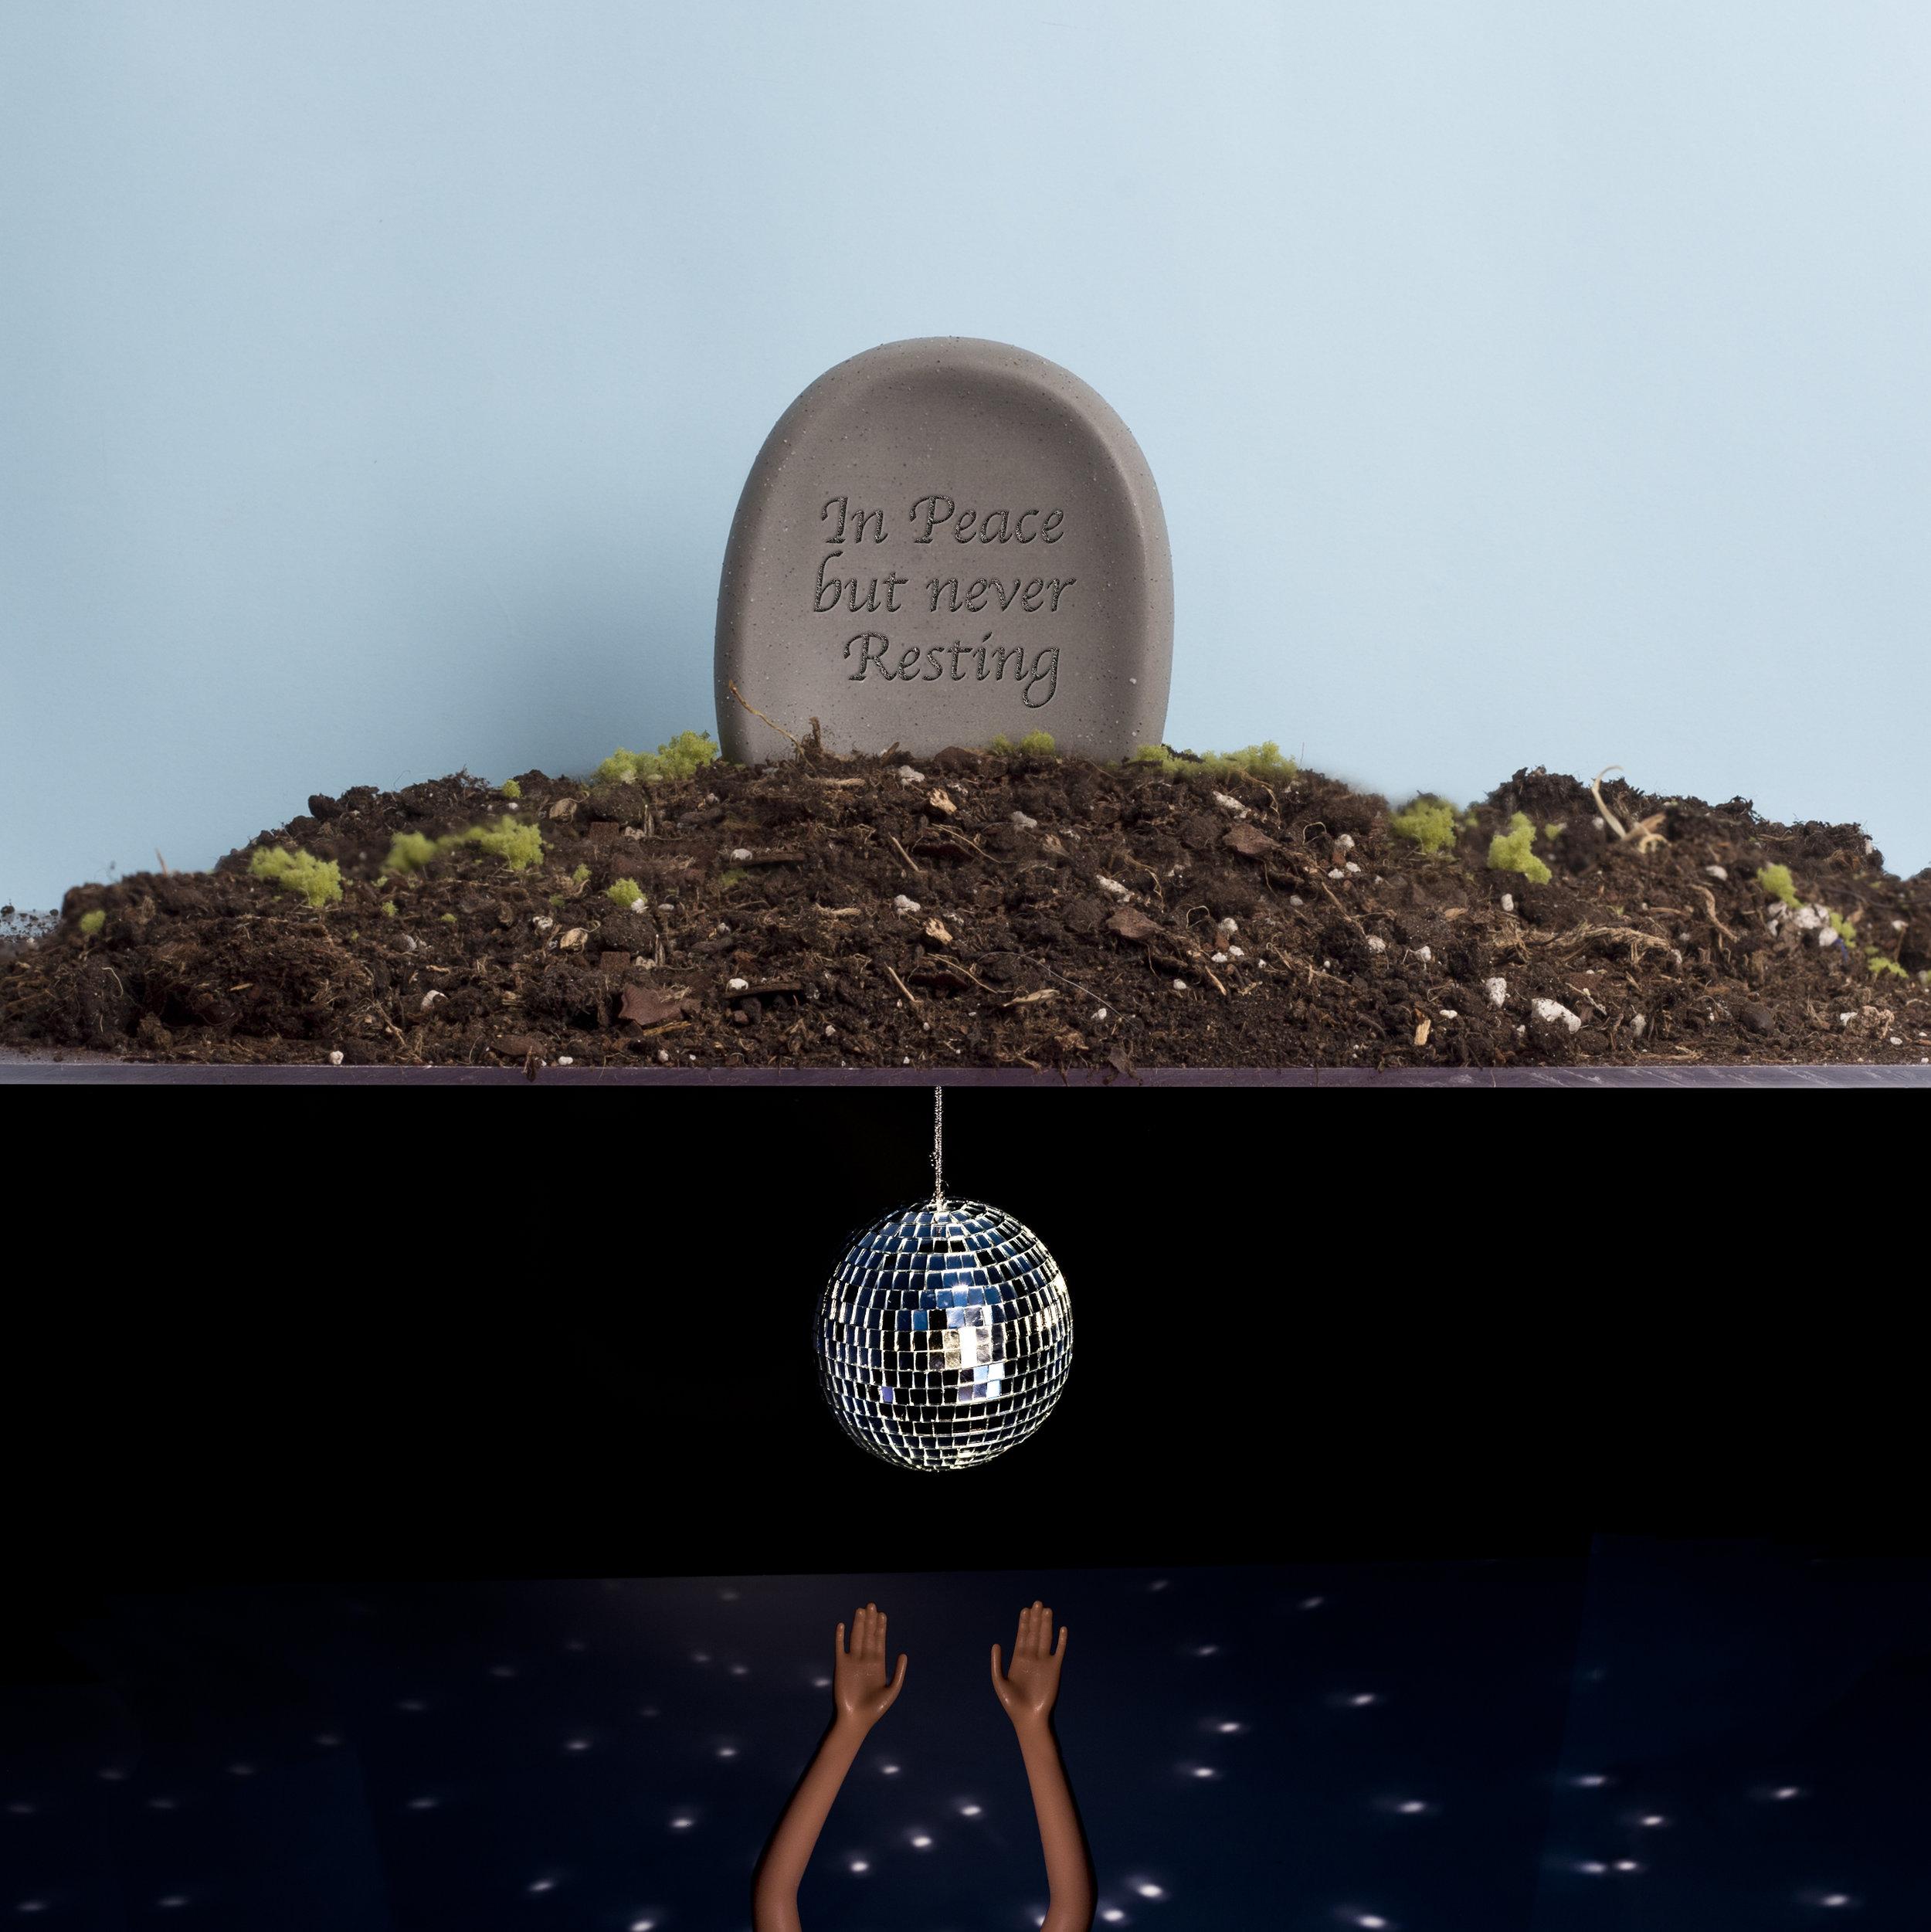 April 6th - Plan Your Epitaph Day